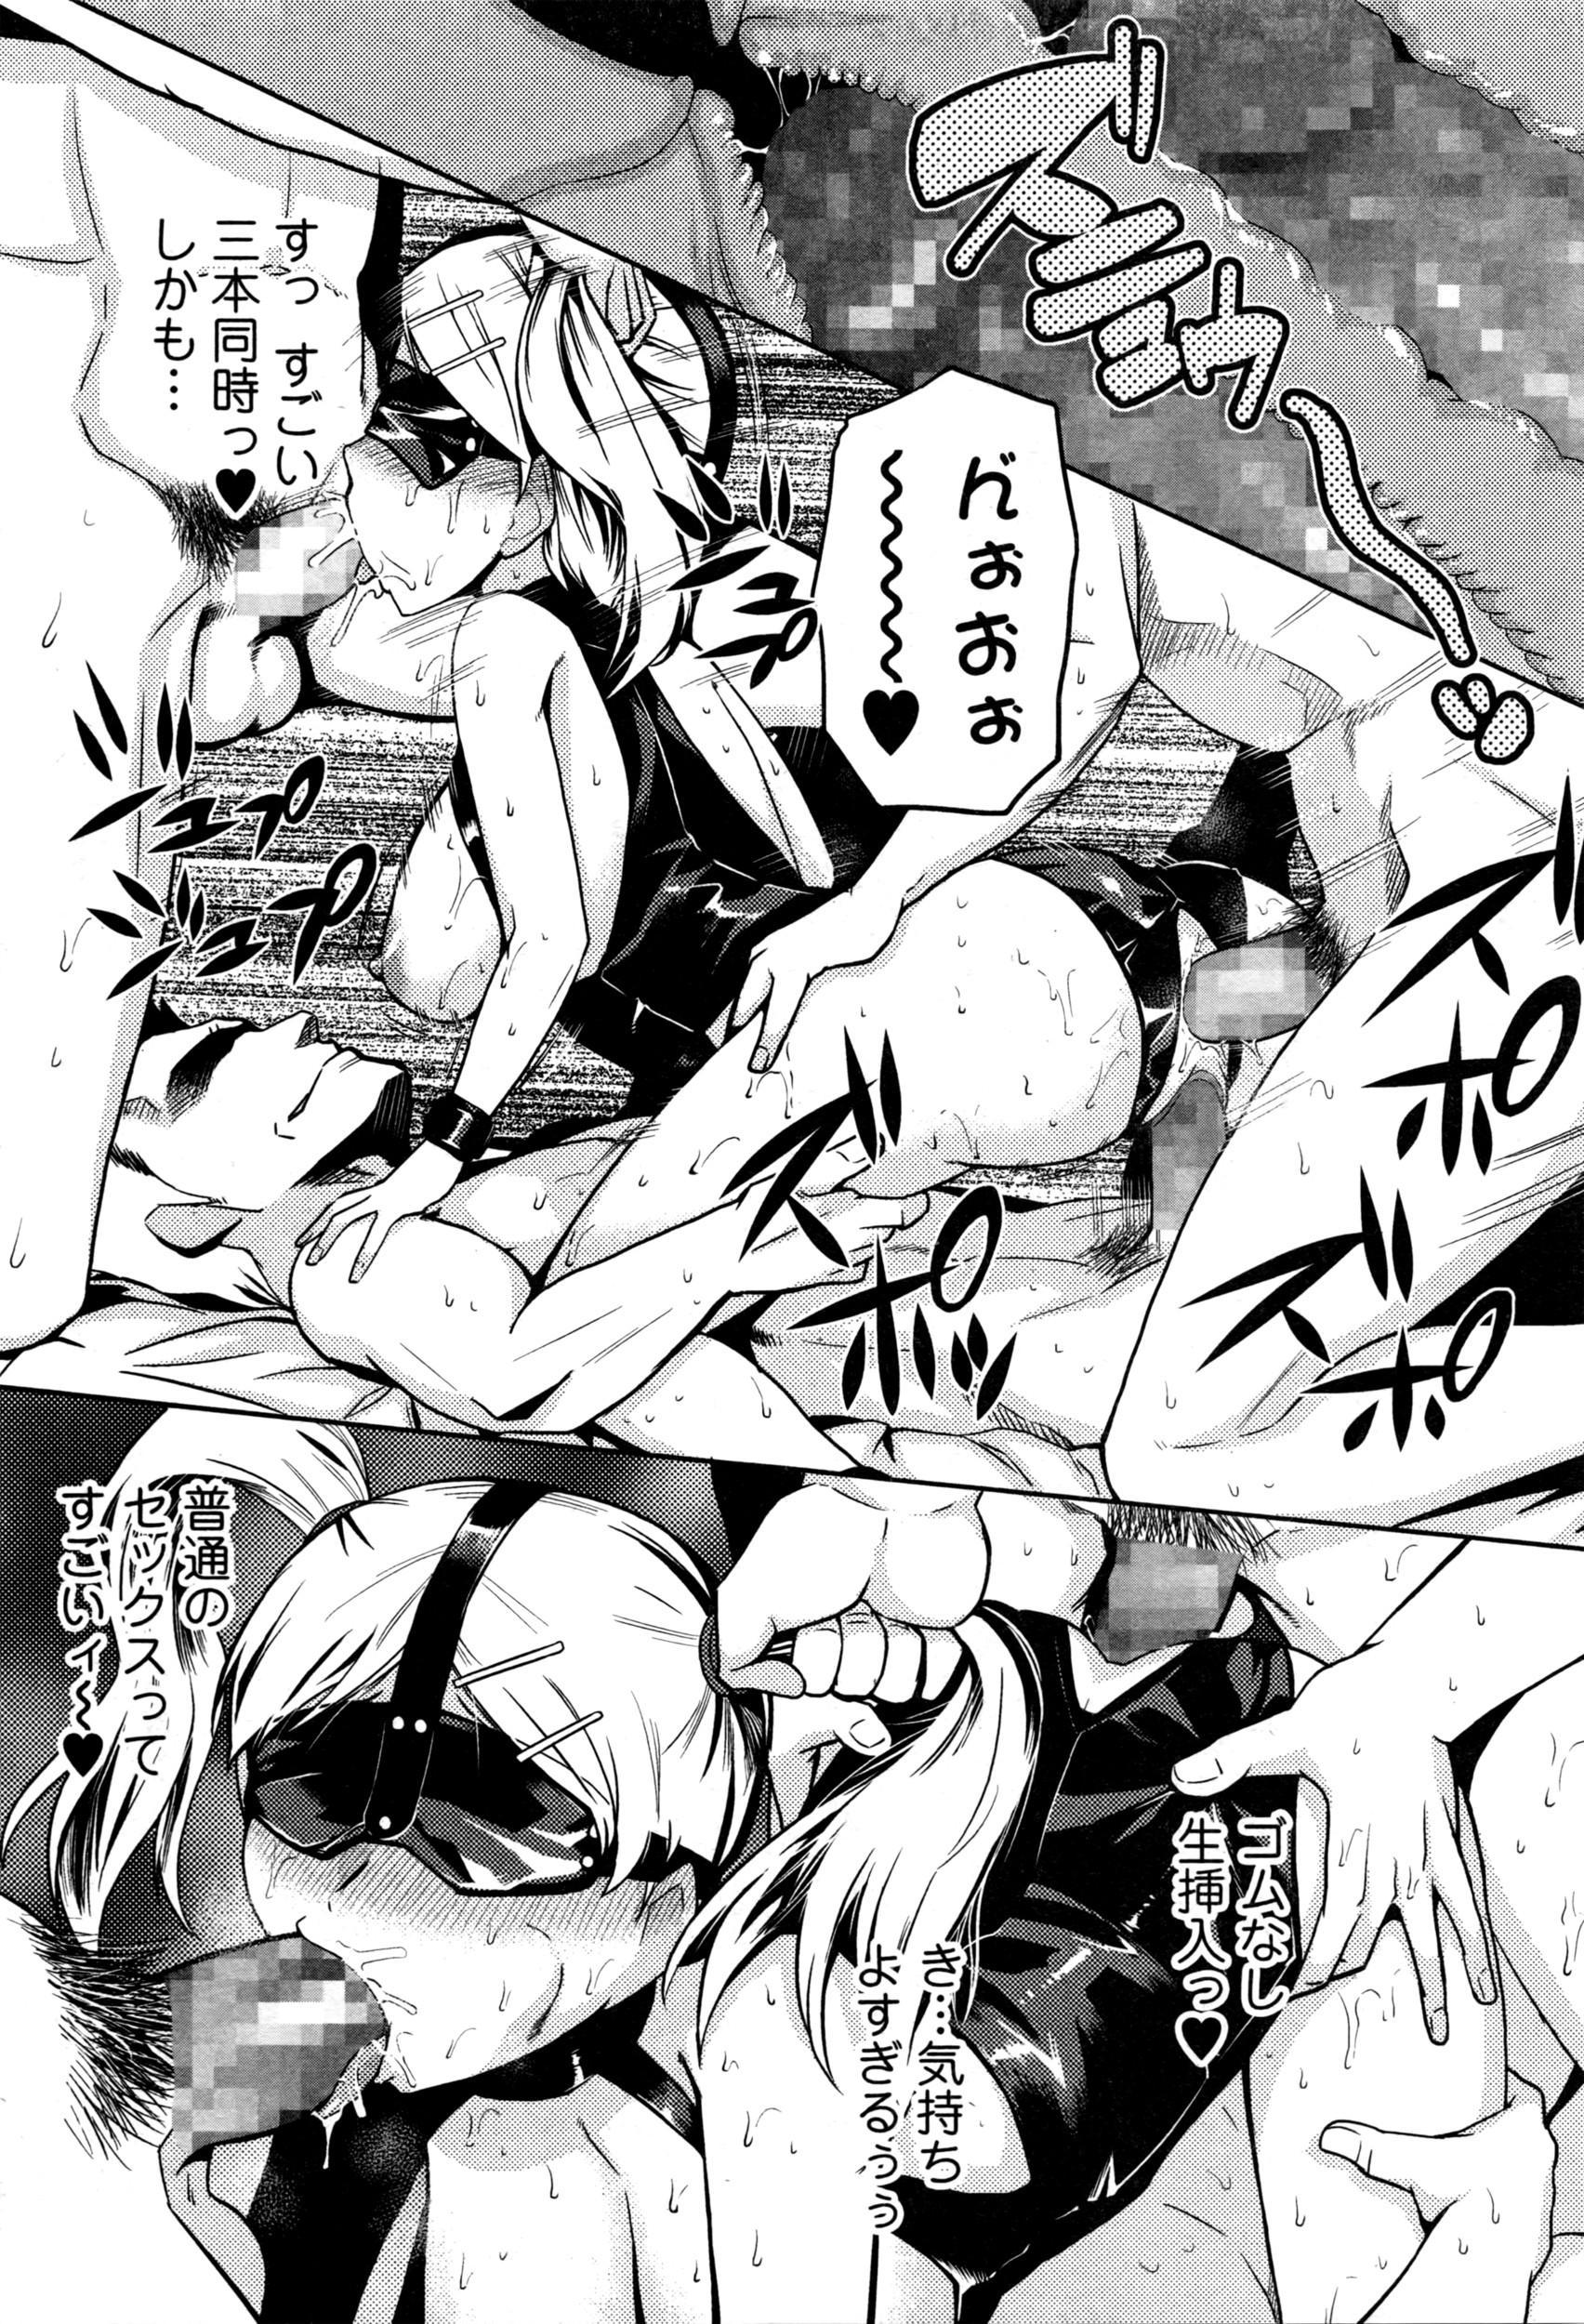 Comic JSCK Vol.3 2016-03 151